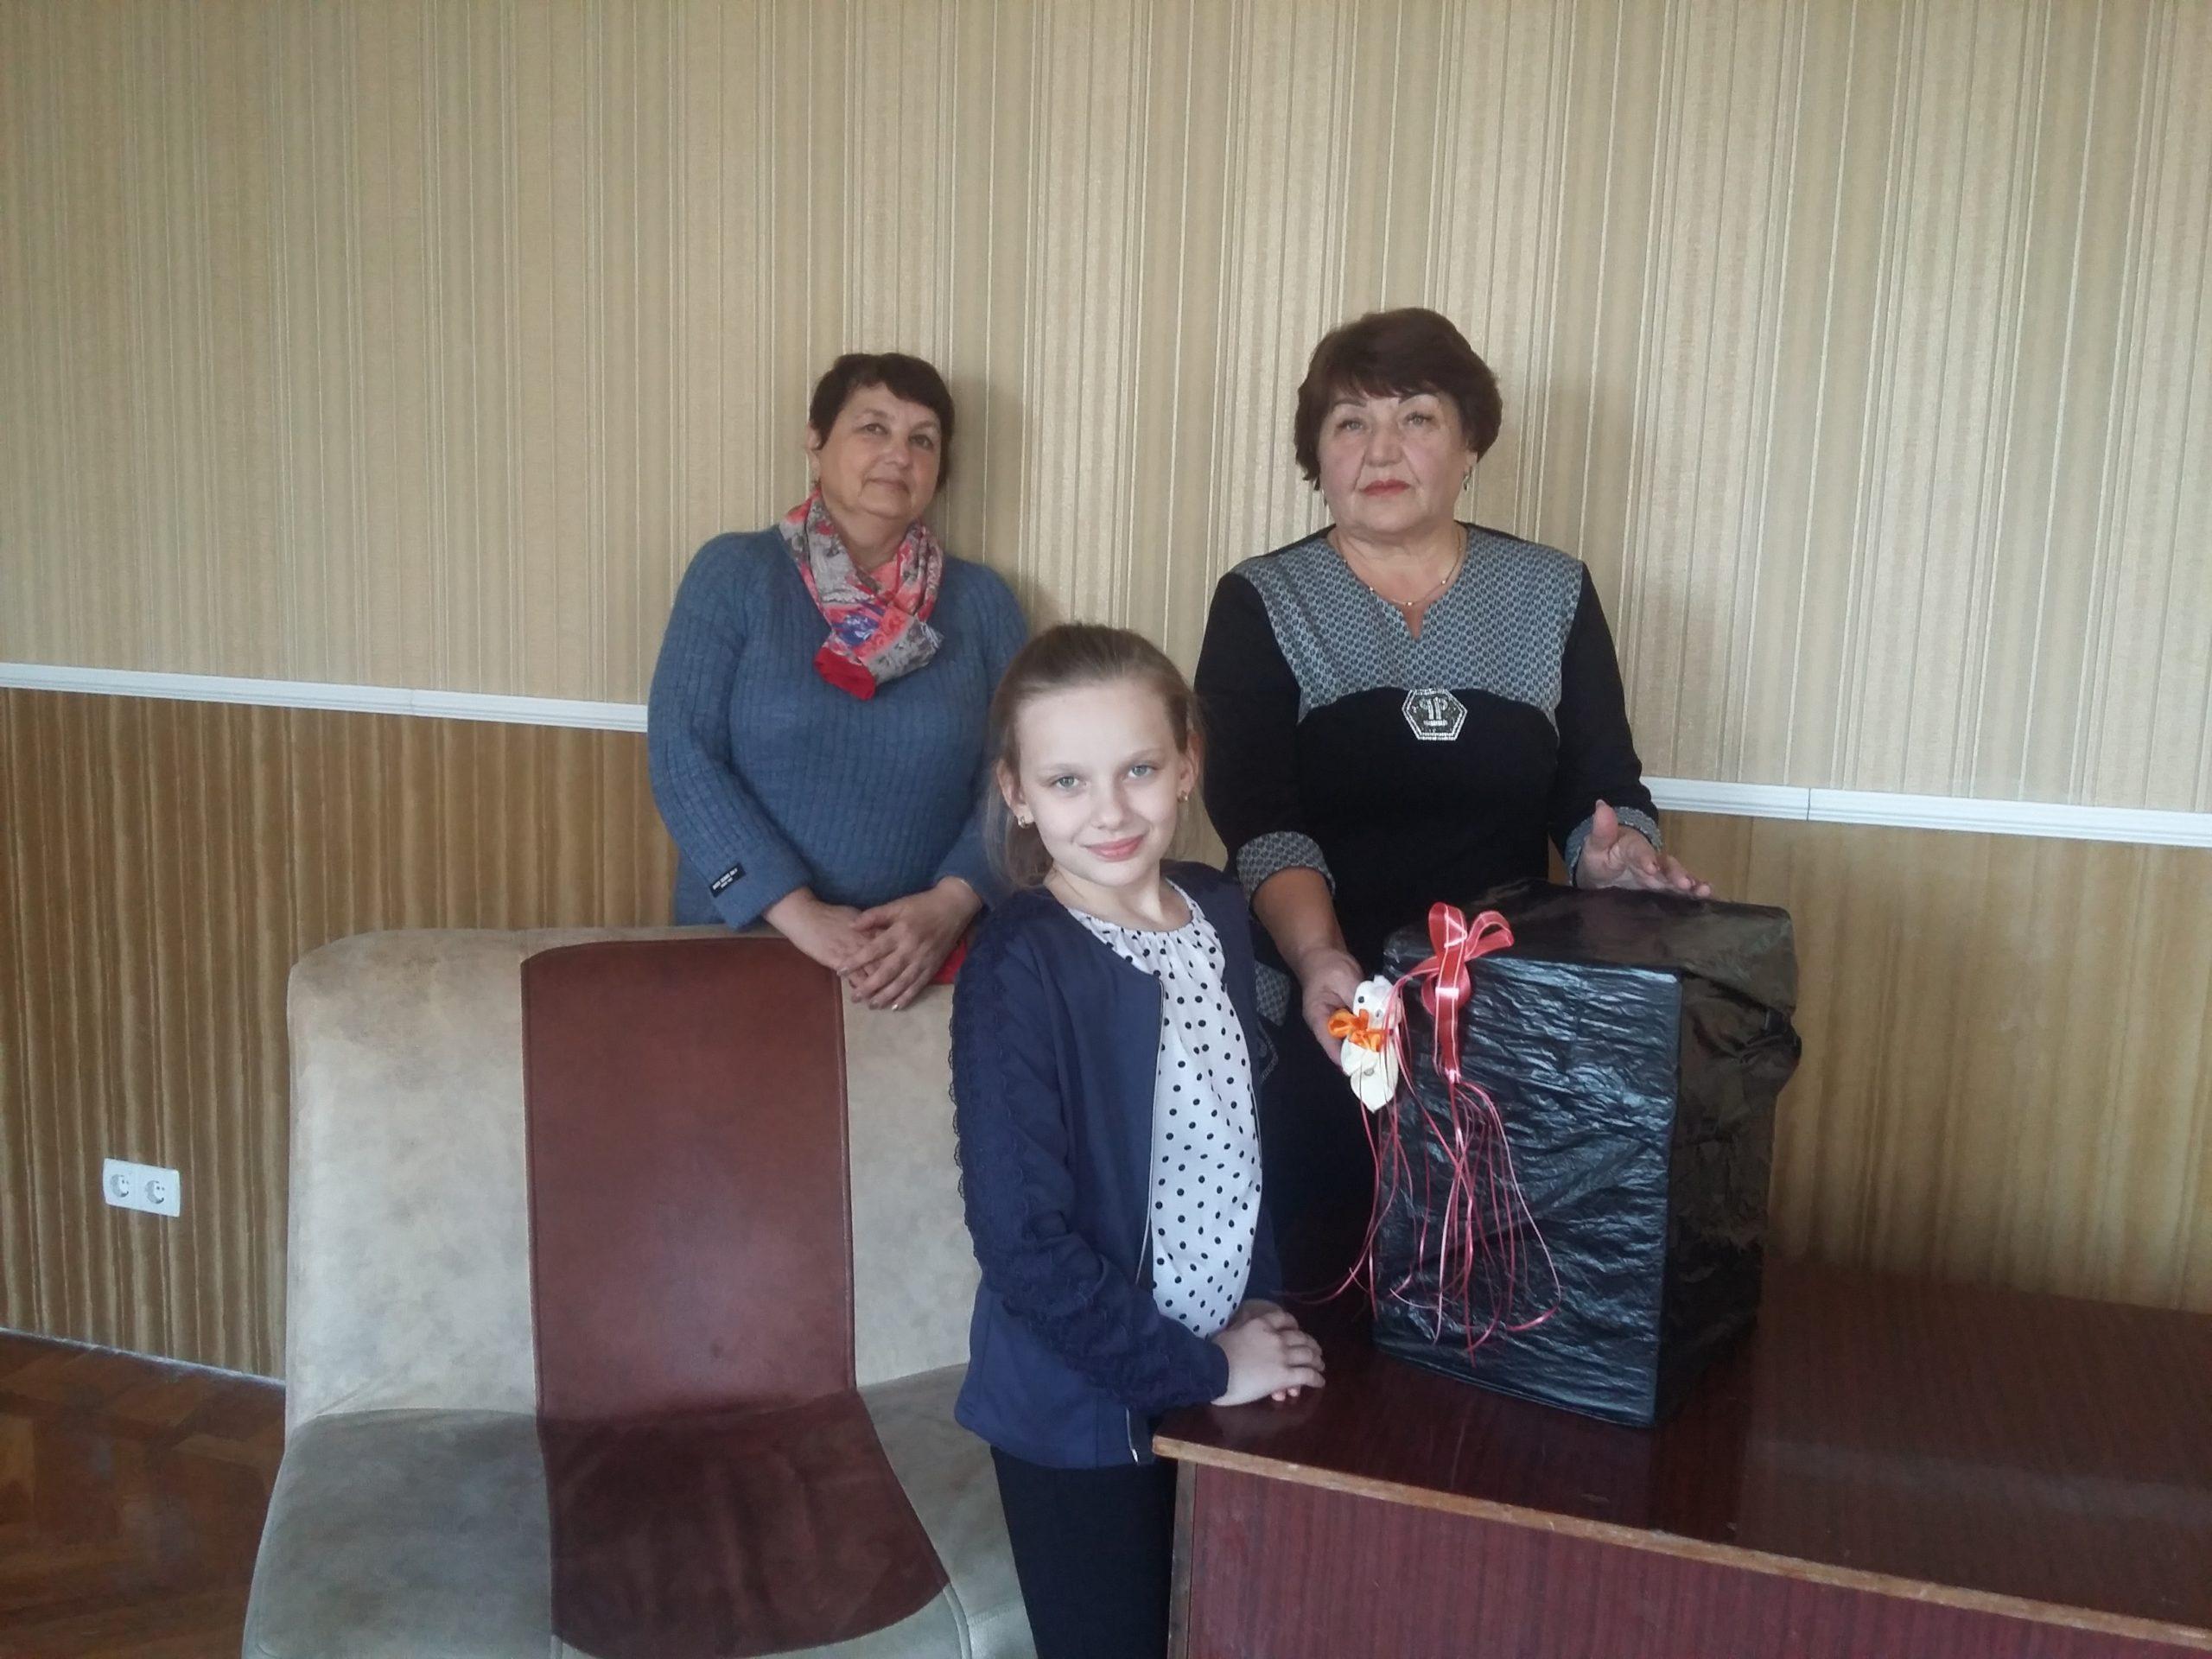 Депутат Народного Совета ЛНР Елена Рахмукова посетила ребенка с инвалидностью в Антраците 1